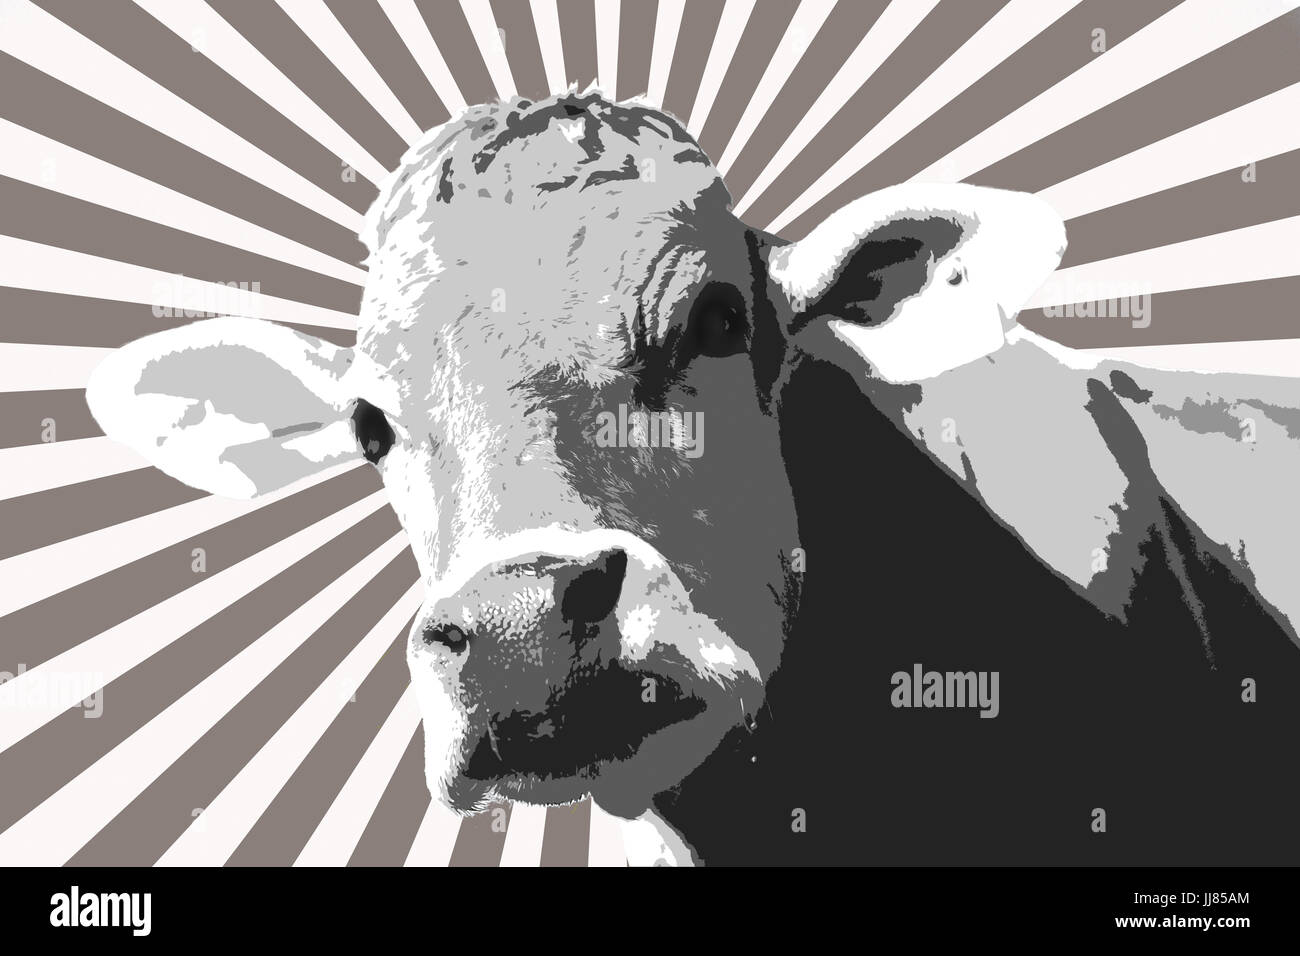 Europa, Schweiz, St. Gallen, digital bearbeitet neugierig Kuh abstrakte artful, neugierige Kuh kunstvoll abstrakt Stockbild